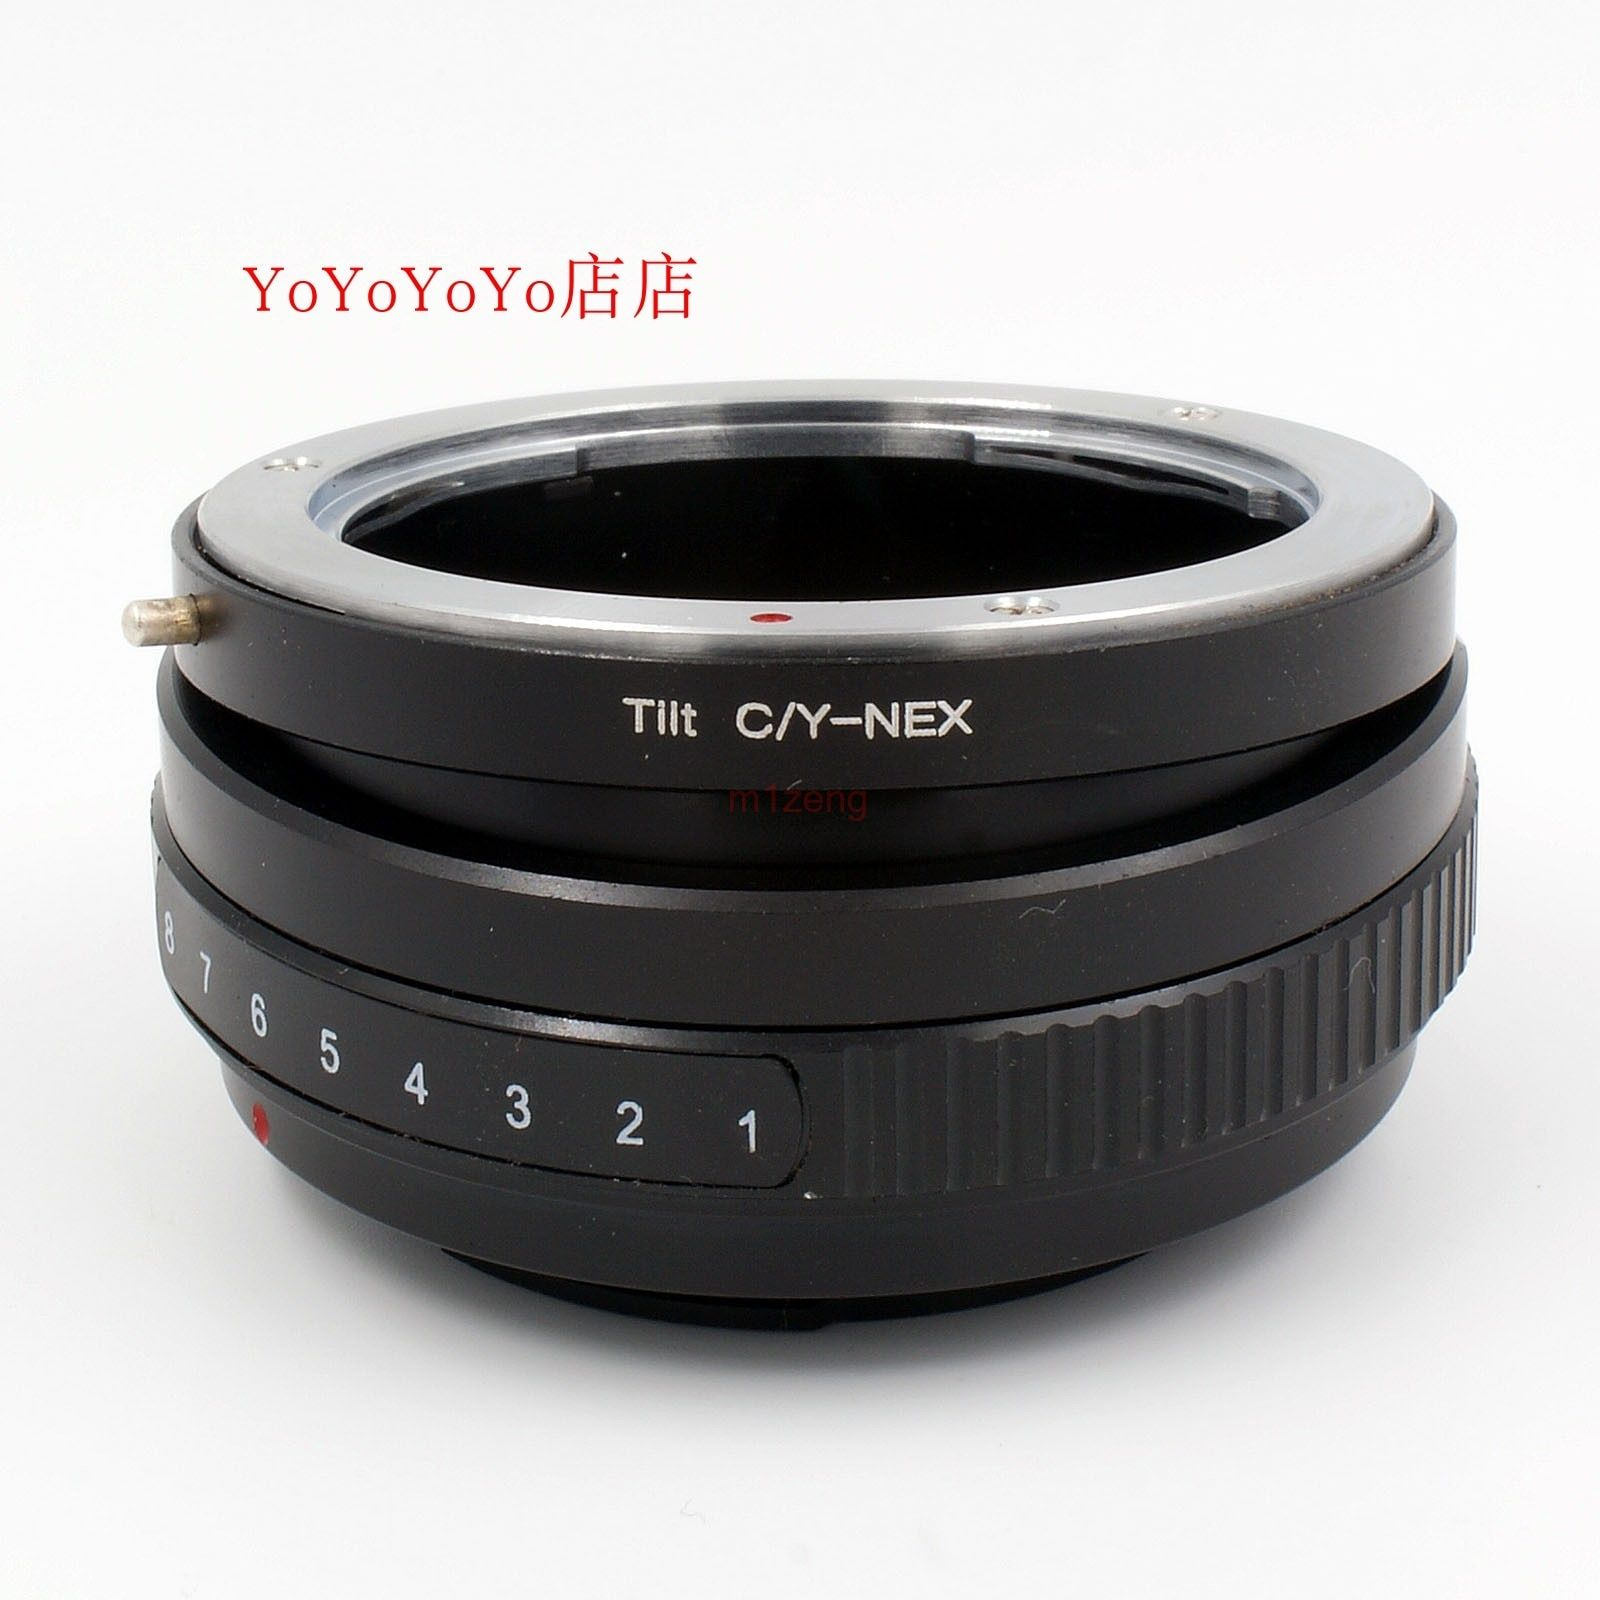 Cy c/y Contax Yashica objektiv zu E mount nex tilt adapter ring für NEX-3/5/6 /7 A7 A7II A7r A5100 A7s A6500 A5000 A6000 kamera